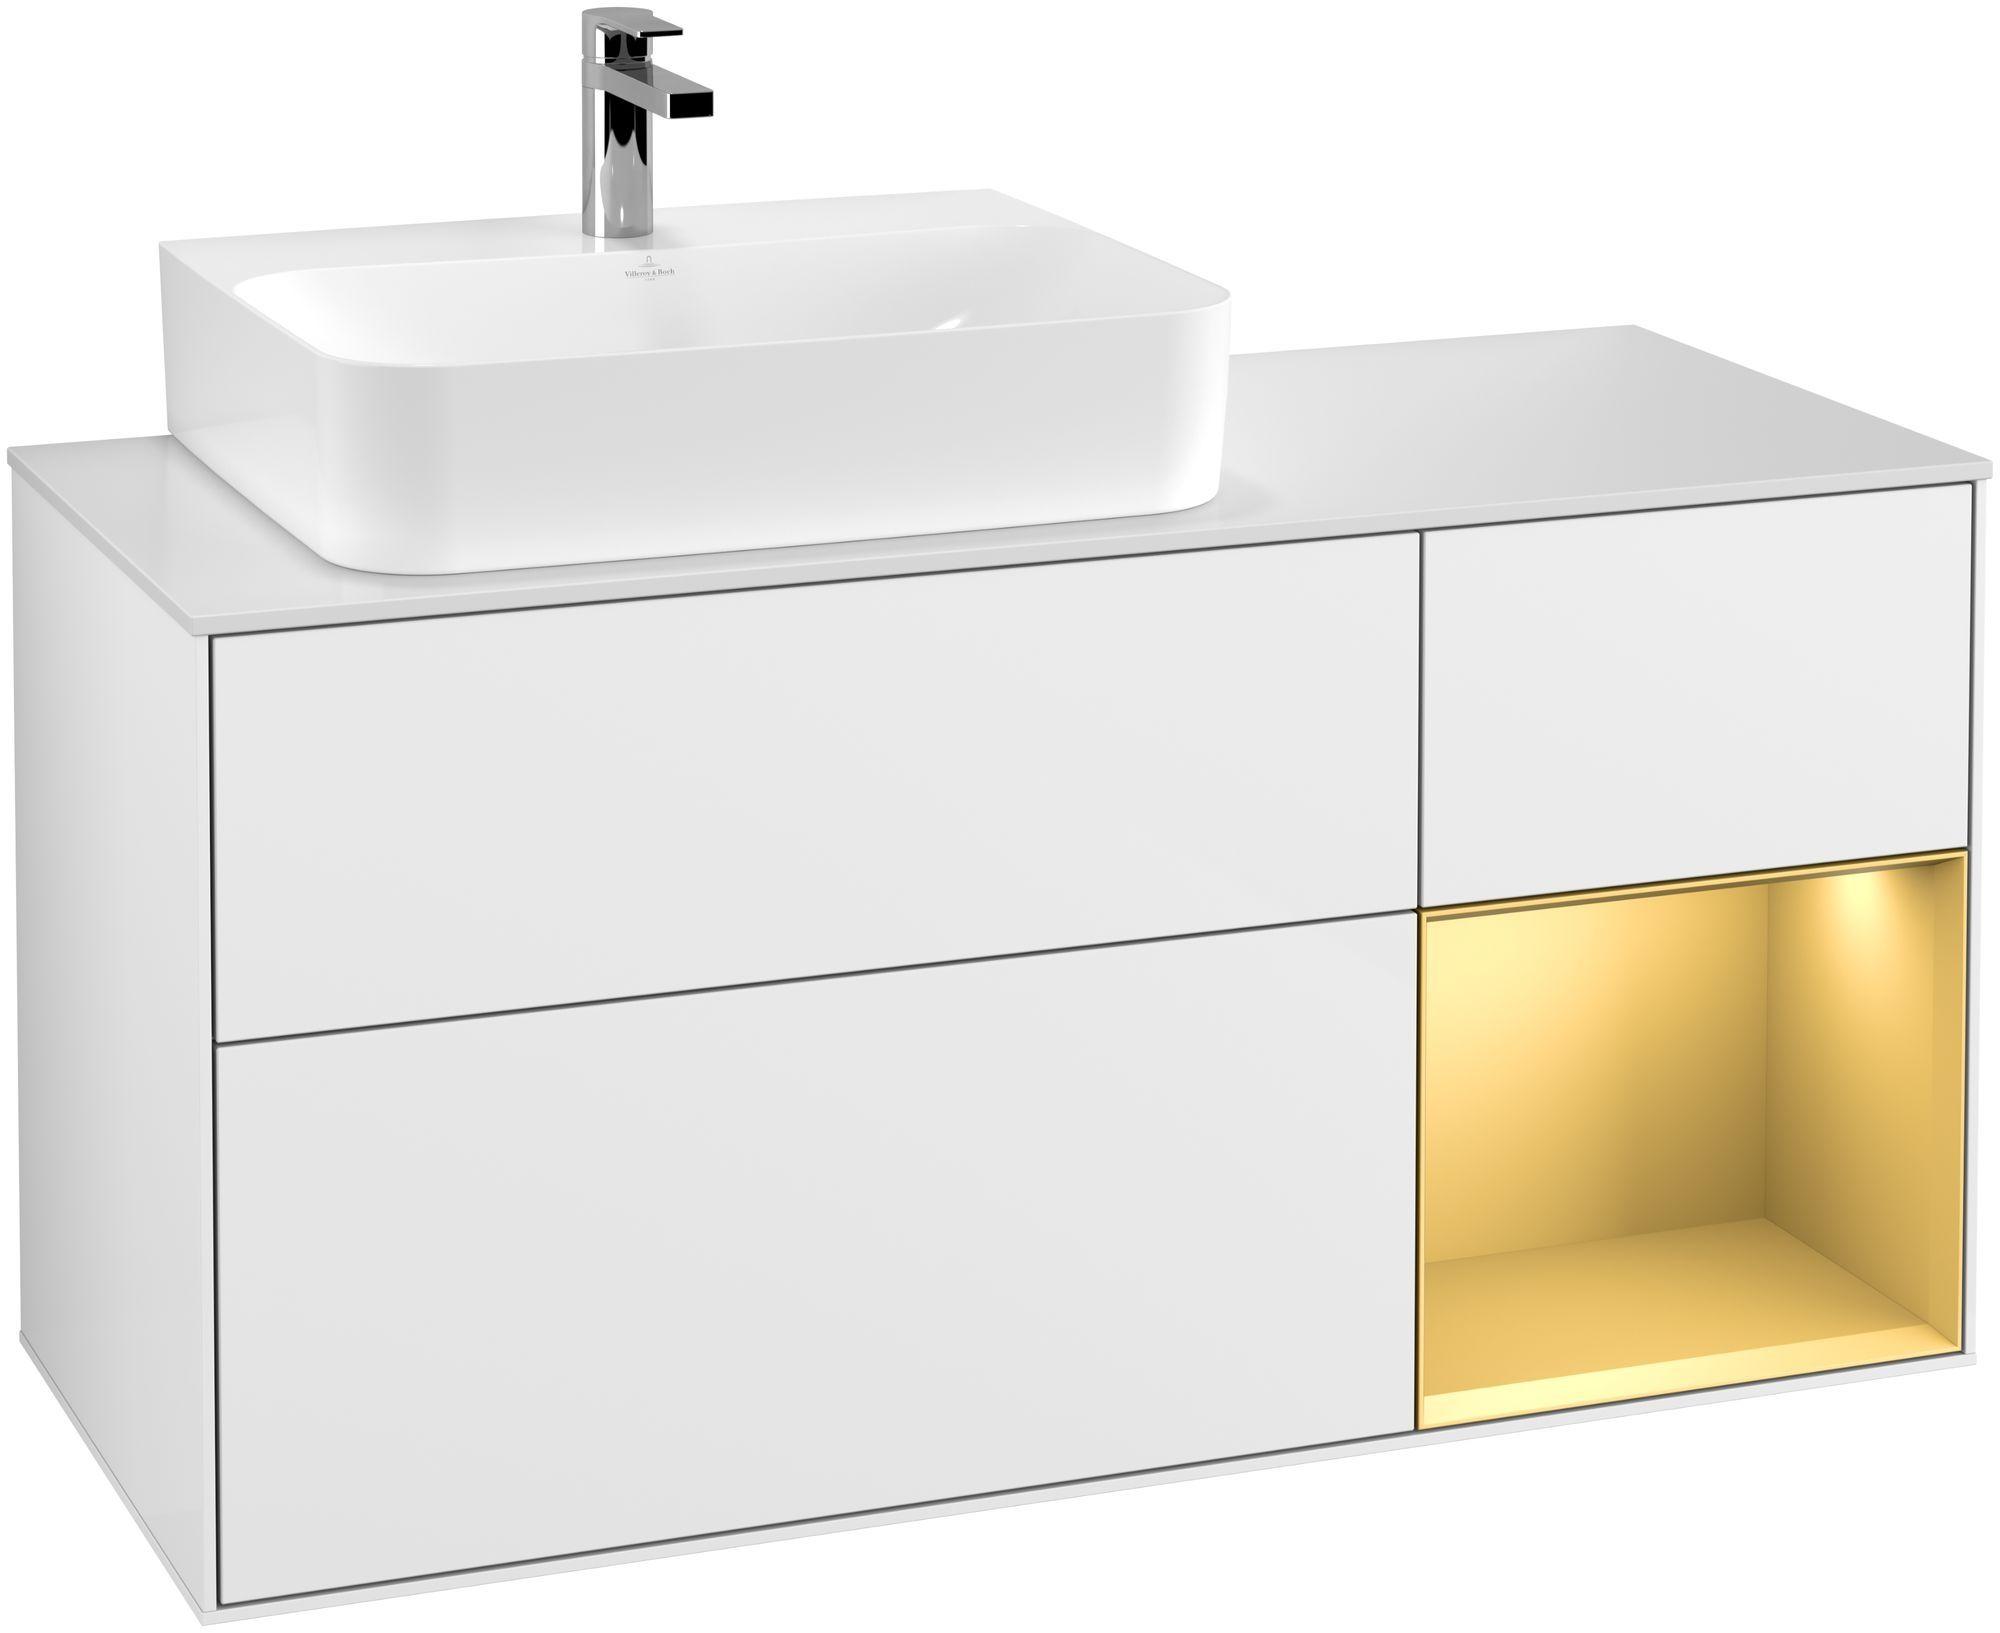 Villeroy & Boch Finion G15 Waschtischunterschrank mit Regalelement 3 Auszüge Waschtisch links LED-Beleuchtung B:120xH:60,3xT:50,1cm Front, Korpus: Glossy White Lack, Regal: Gold Matt, Glasplatte: White Matt G151HFGF